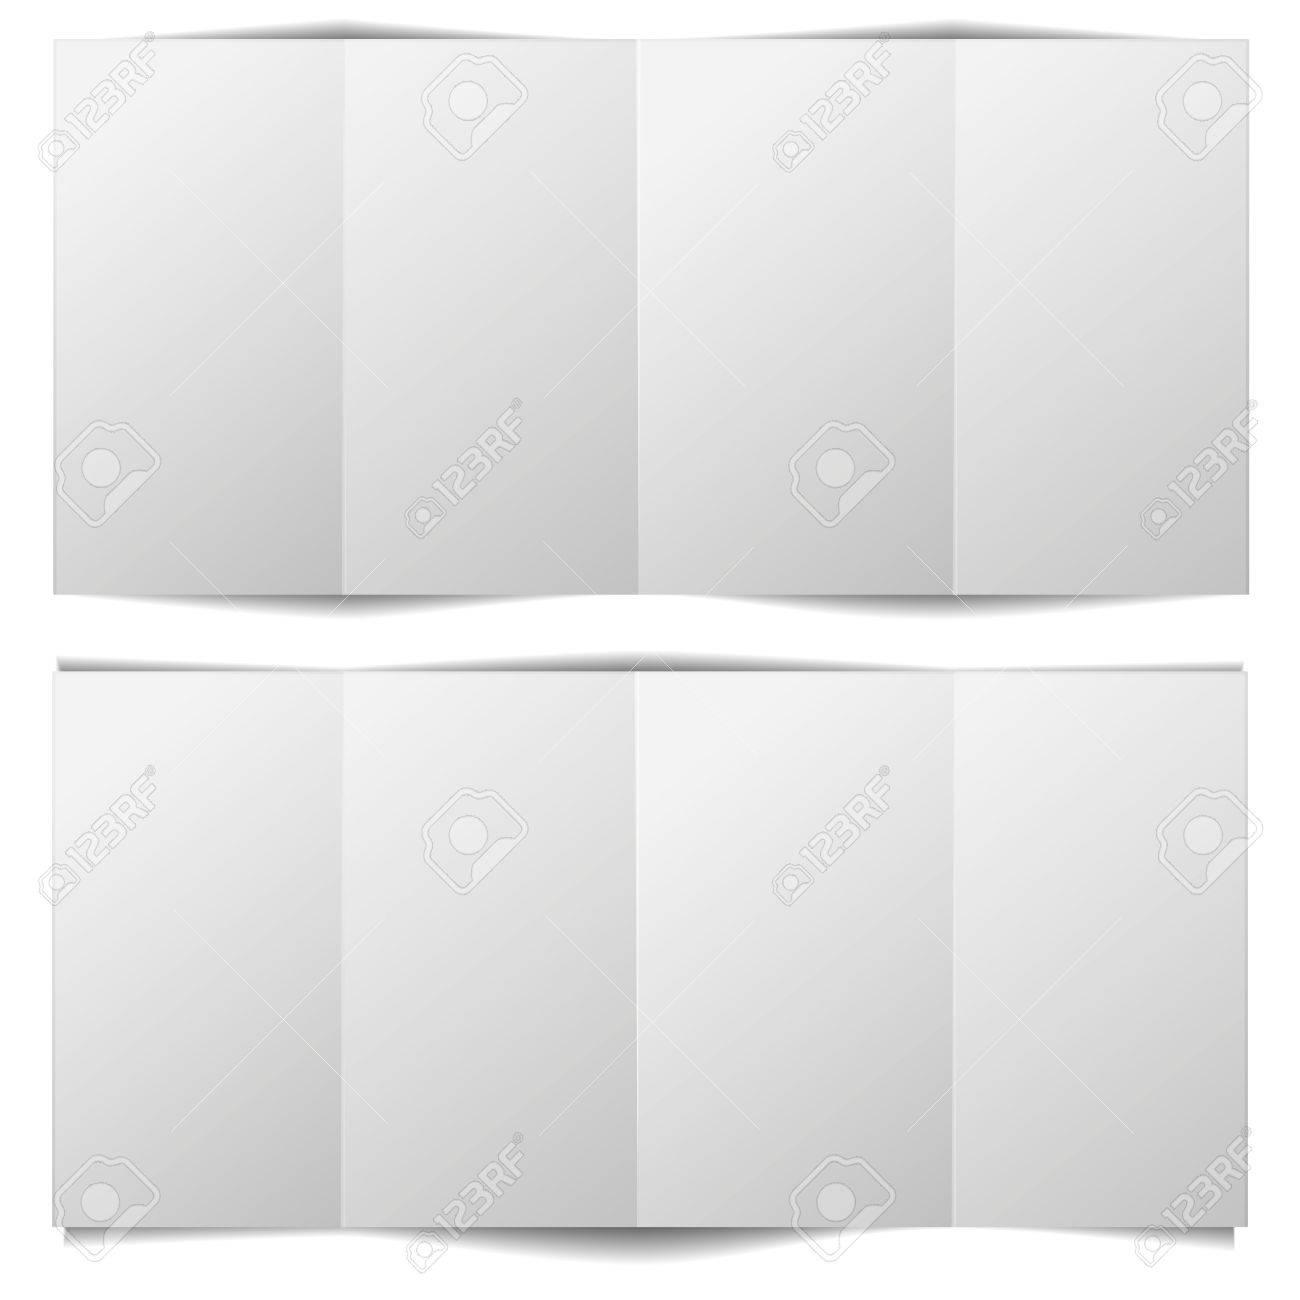 Detailed Illustration Of A Blank Brochure Template Royalty Free - Blank brochure template